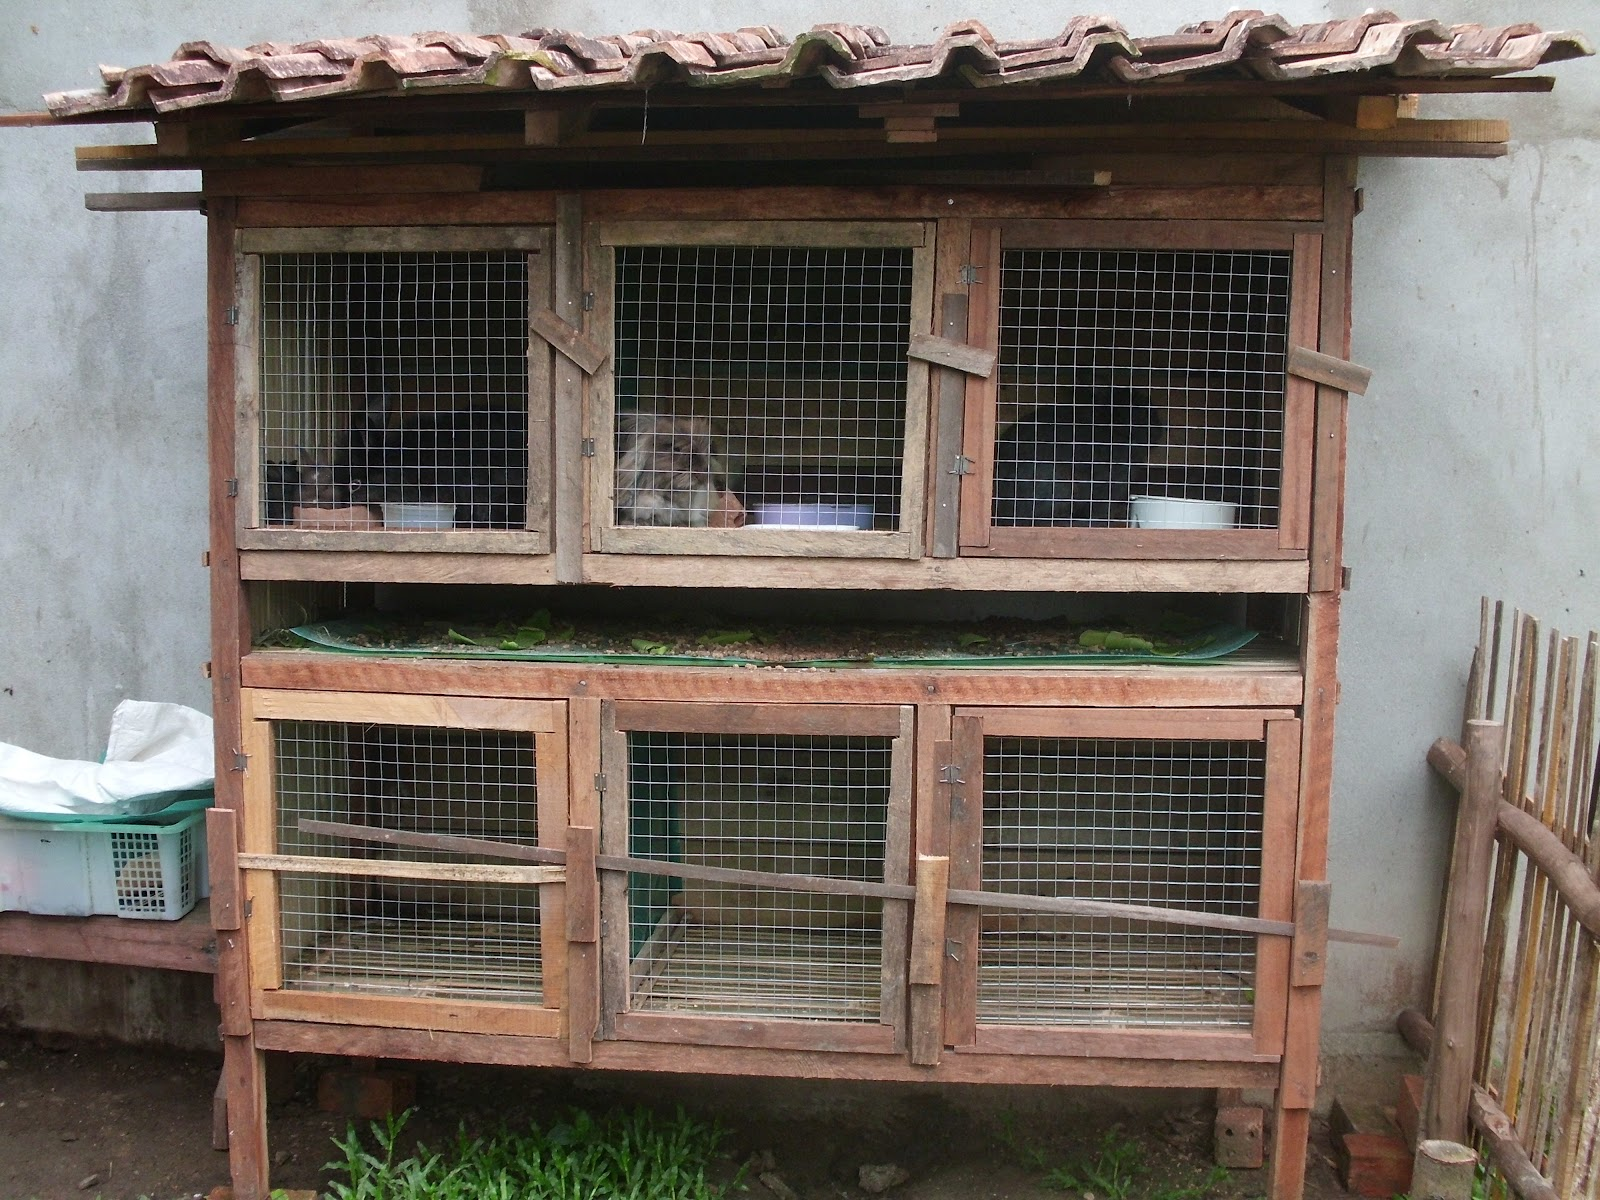 Peternak Kelinci Palembang: Kandang Kelinci Outdor Sederhana